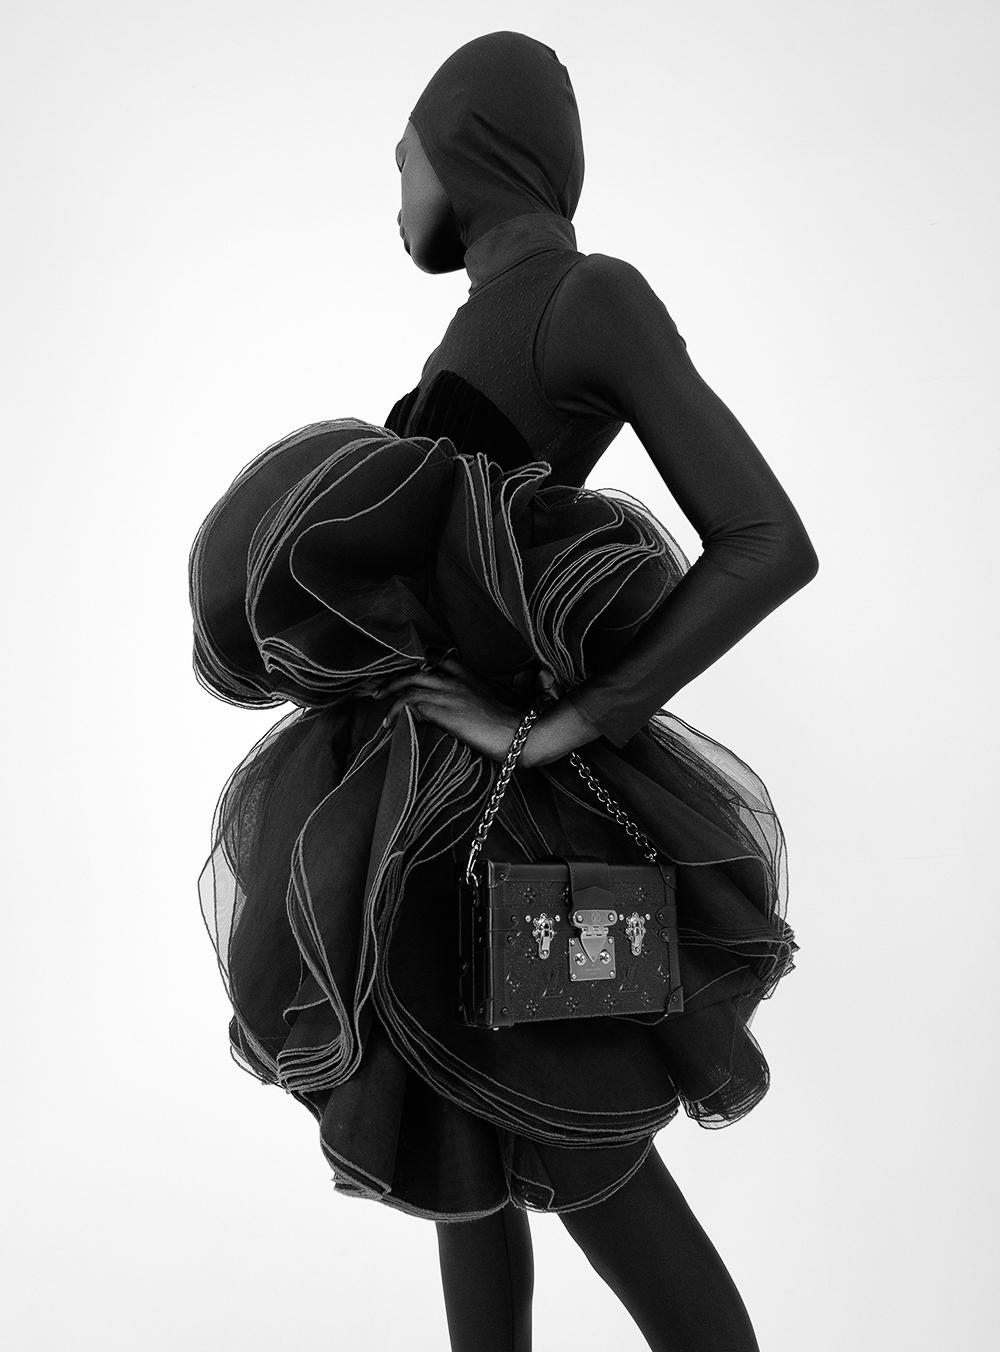 Eftagine Fevilienfor Harpers Bazaar6